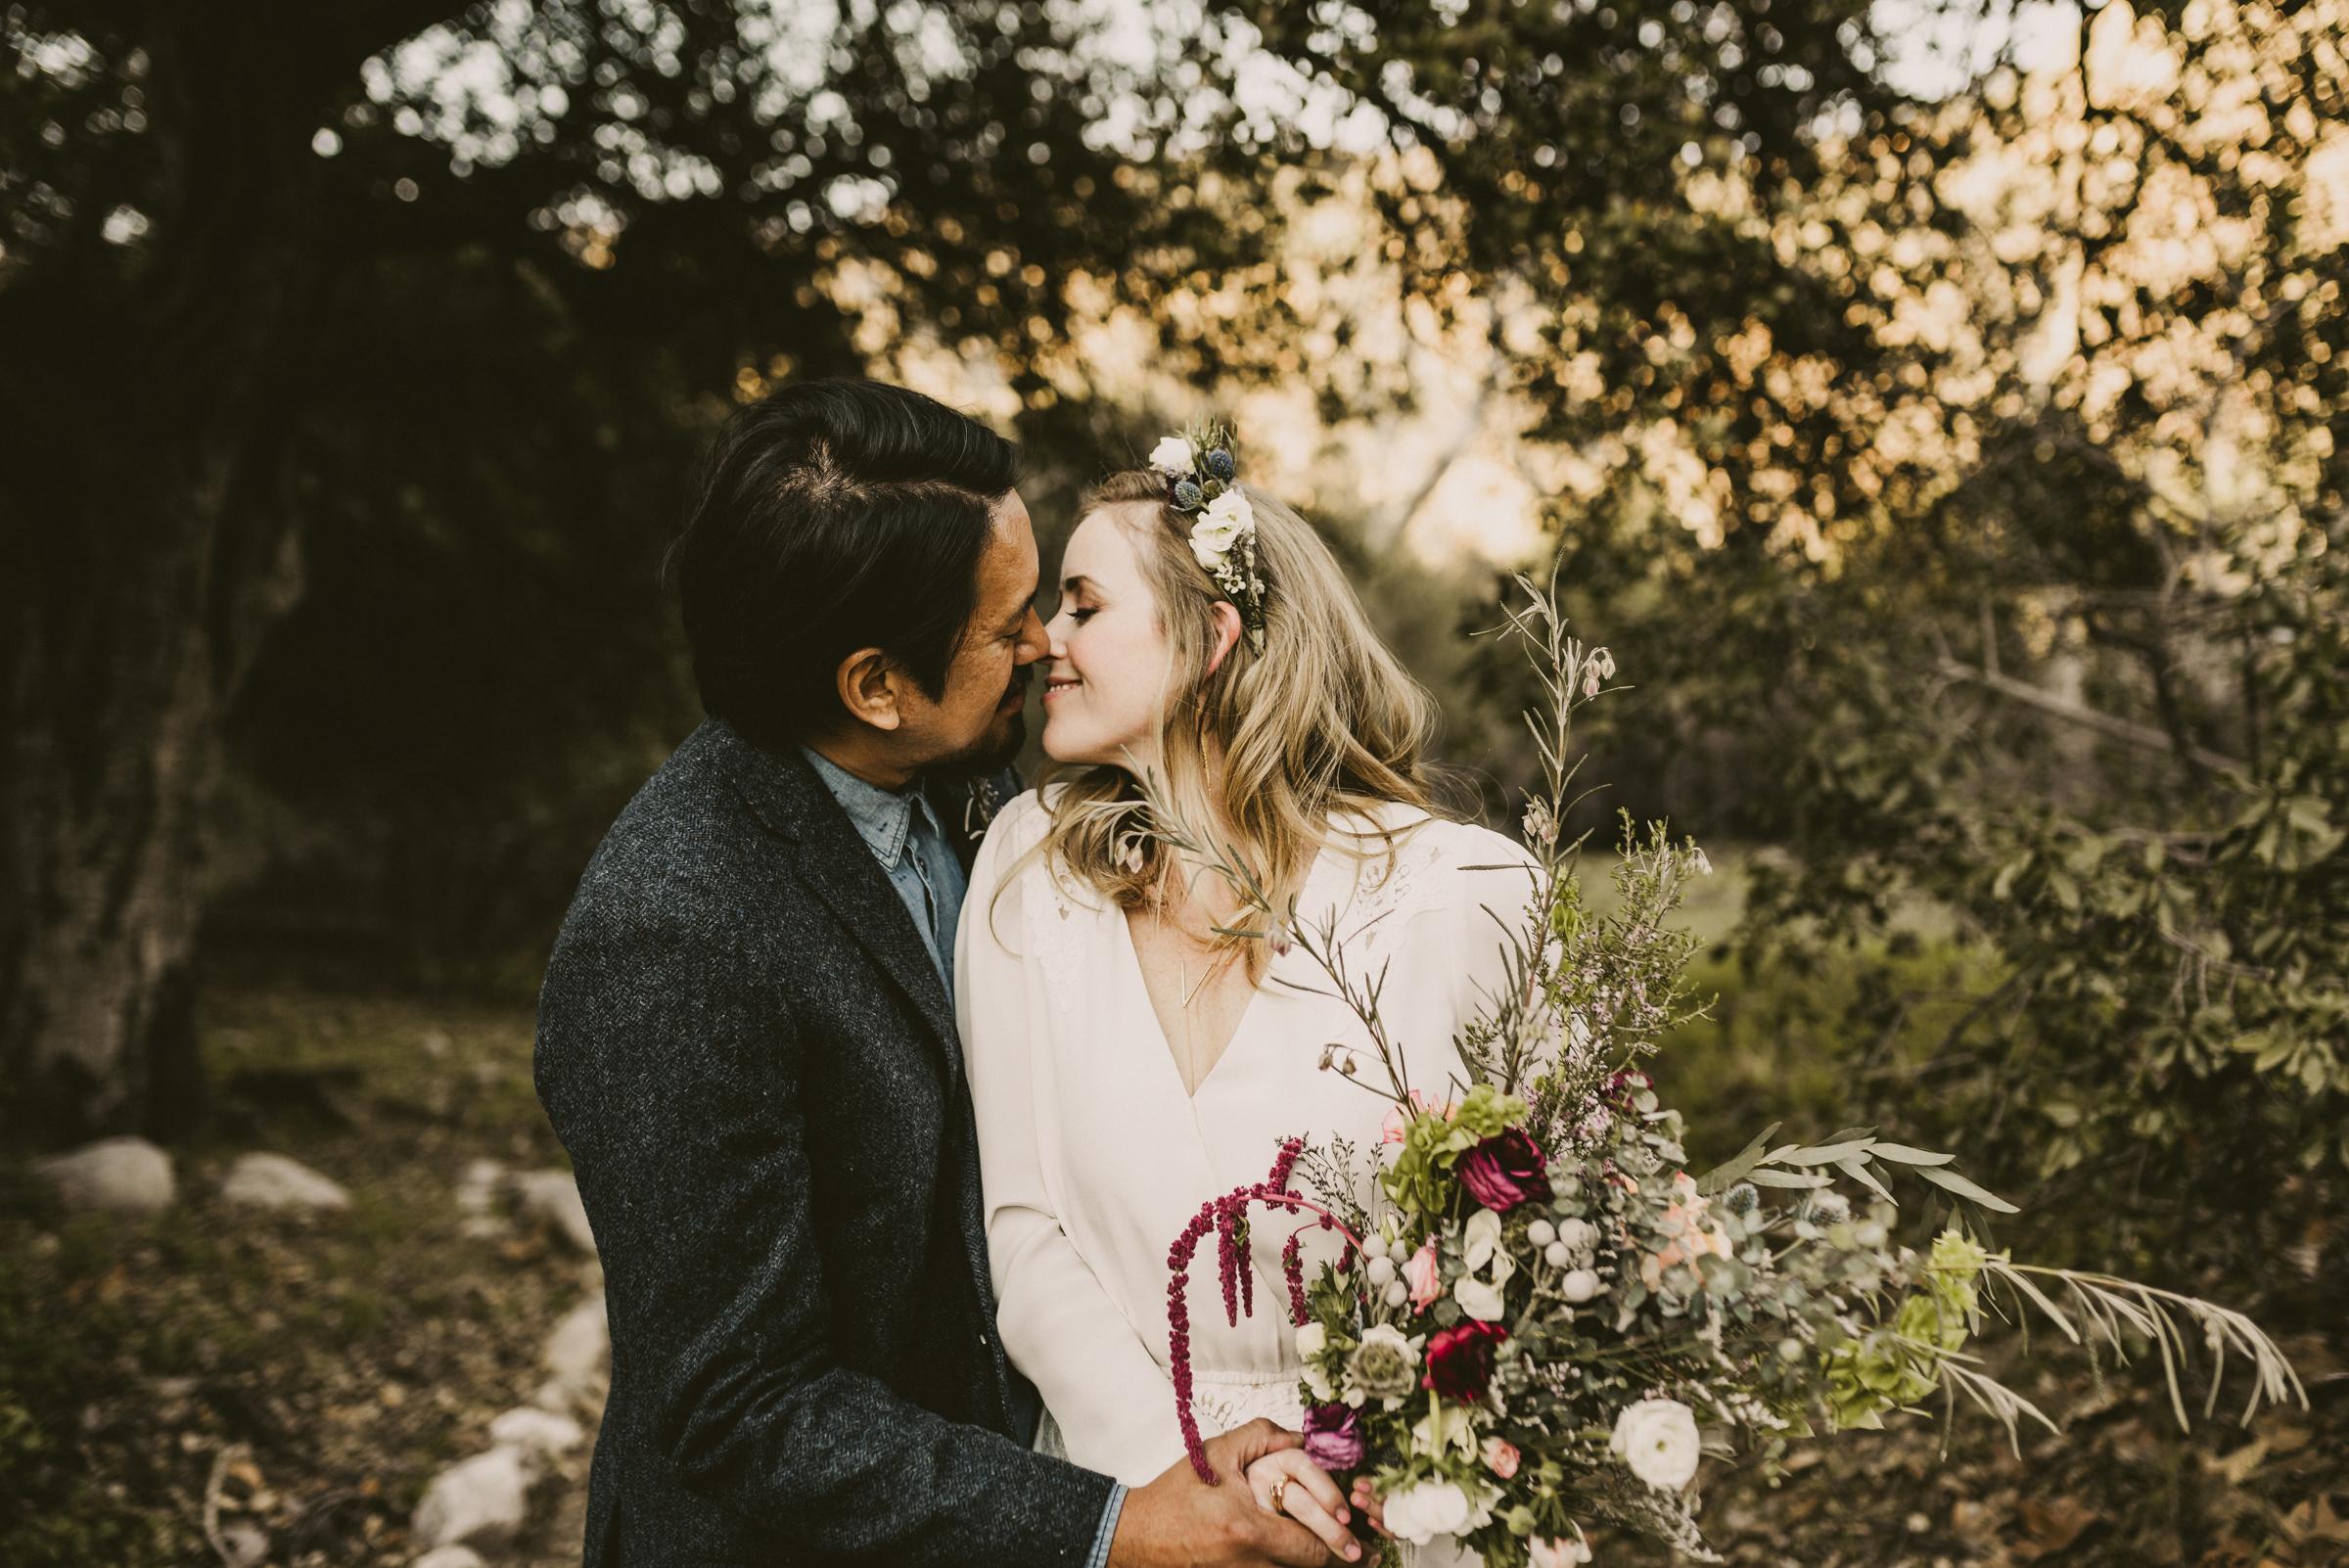 ©Isaiah + Taylor Photography - Intimate Elopement, Eaton Canyon, Los Angeles Wedding Photographer-55.jpg